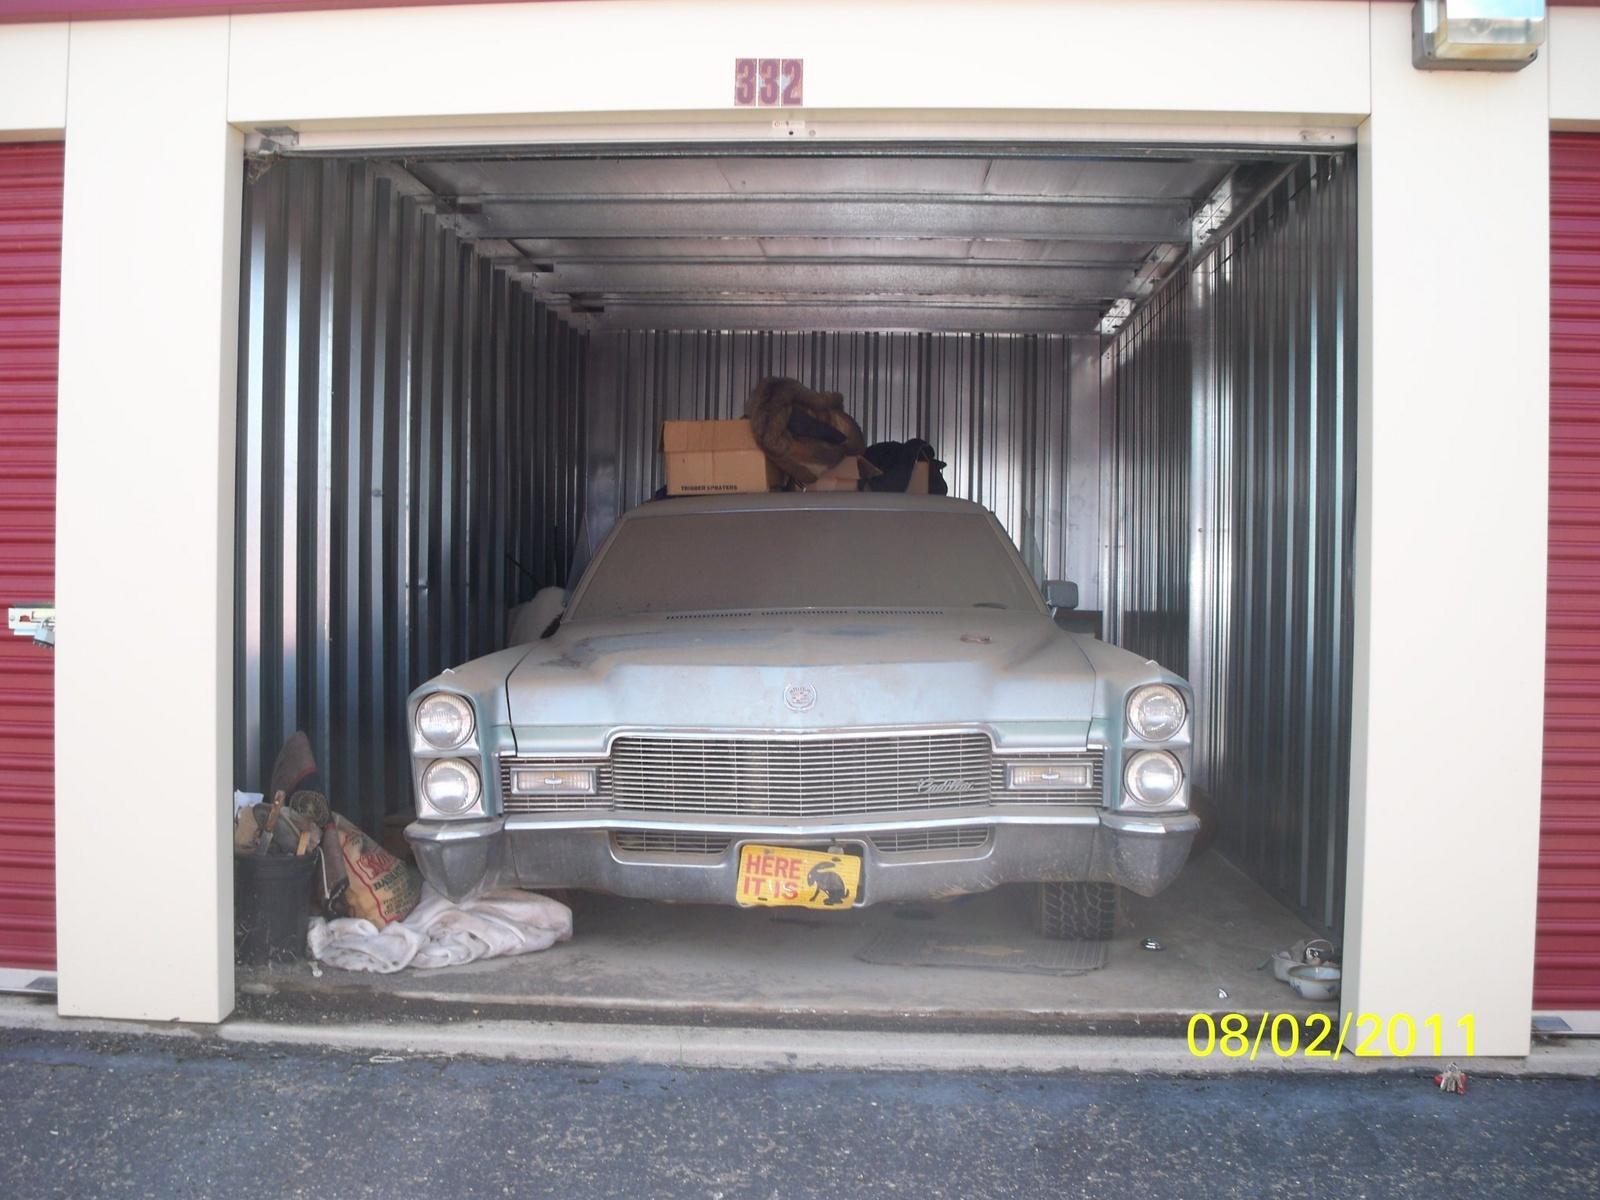 Cadillac Fleetwood Questions - Vin Number - CarGurus